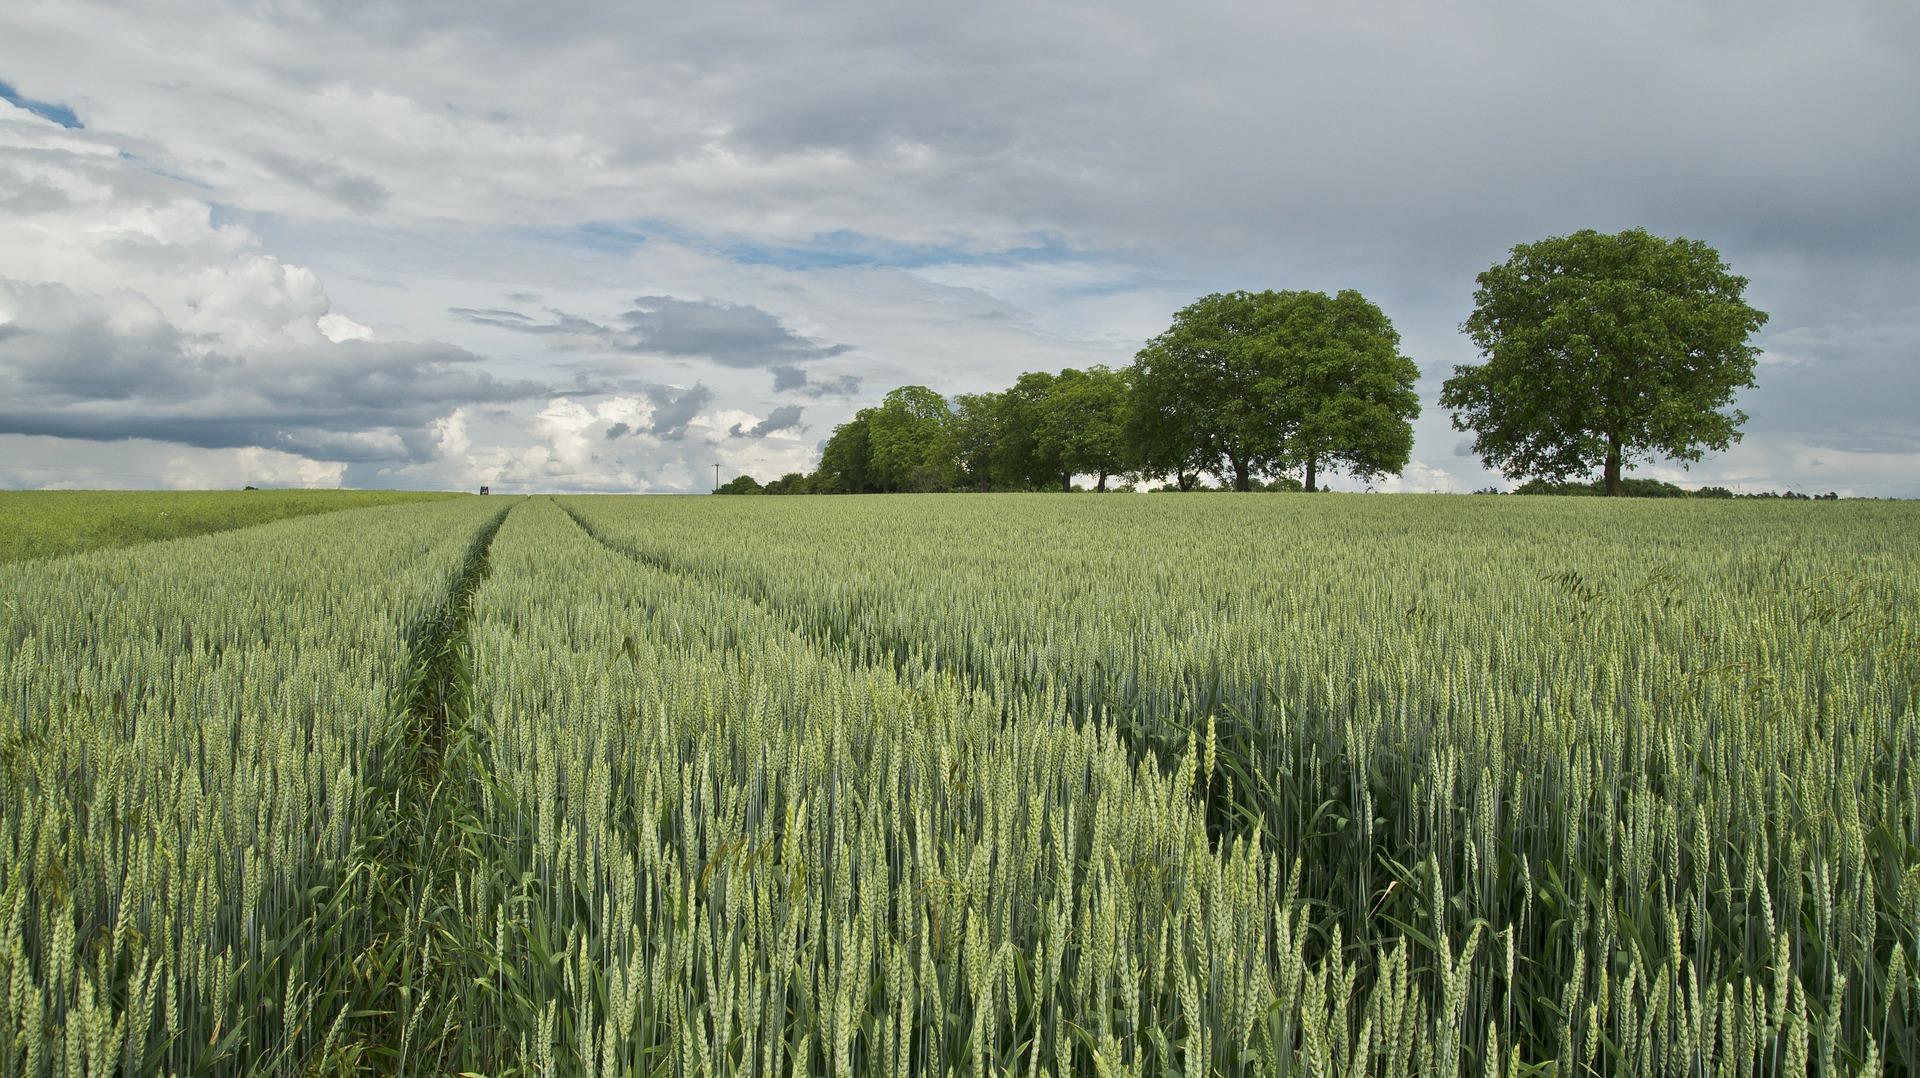 Hipoteka na gruntach rolnych